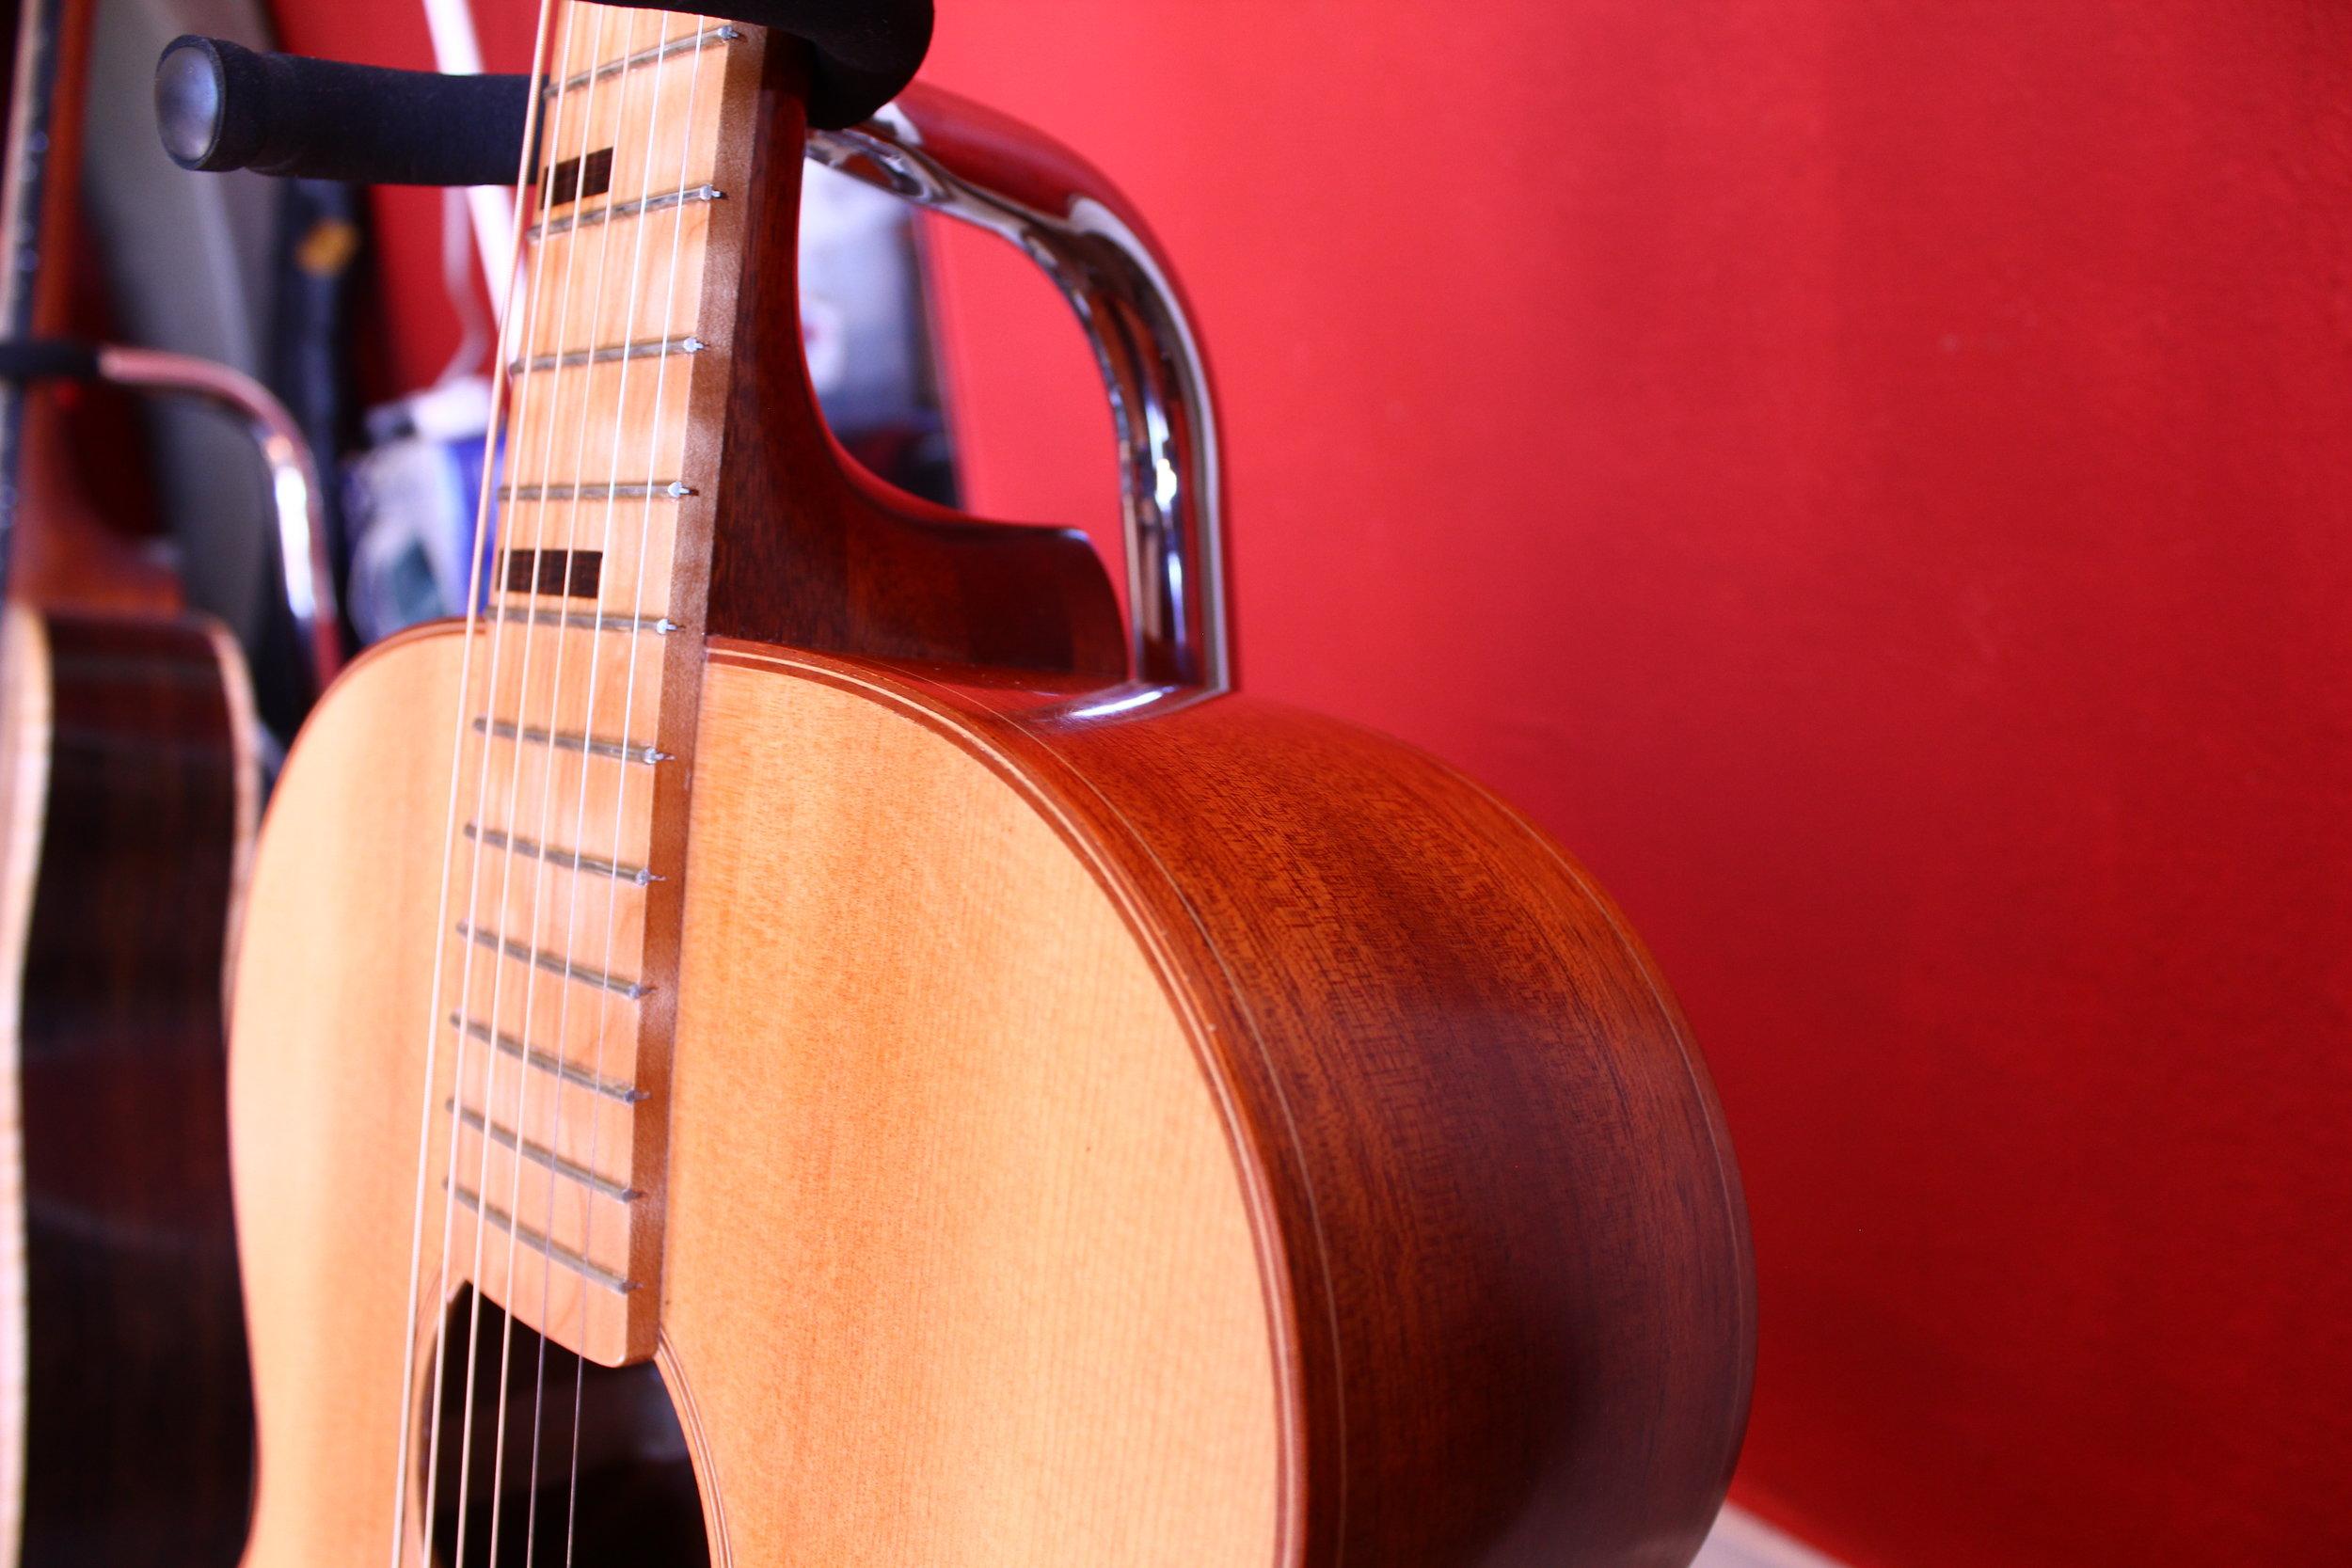 RB-000 jumbo acoustic